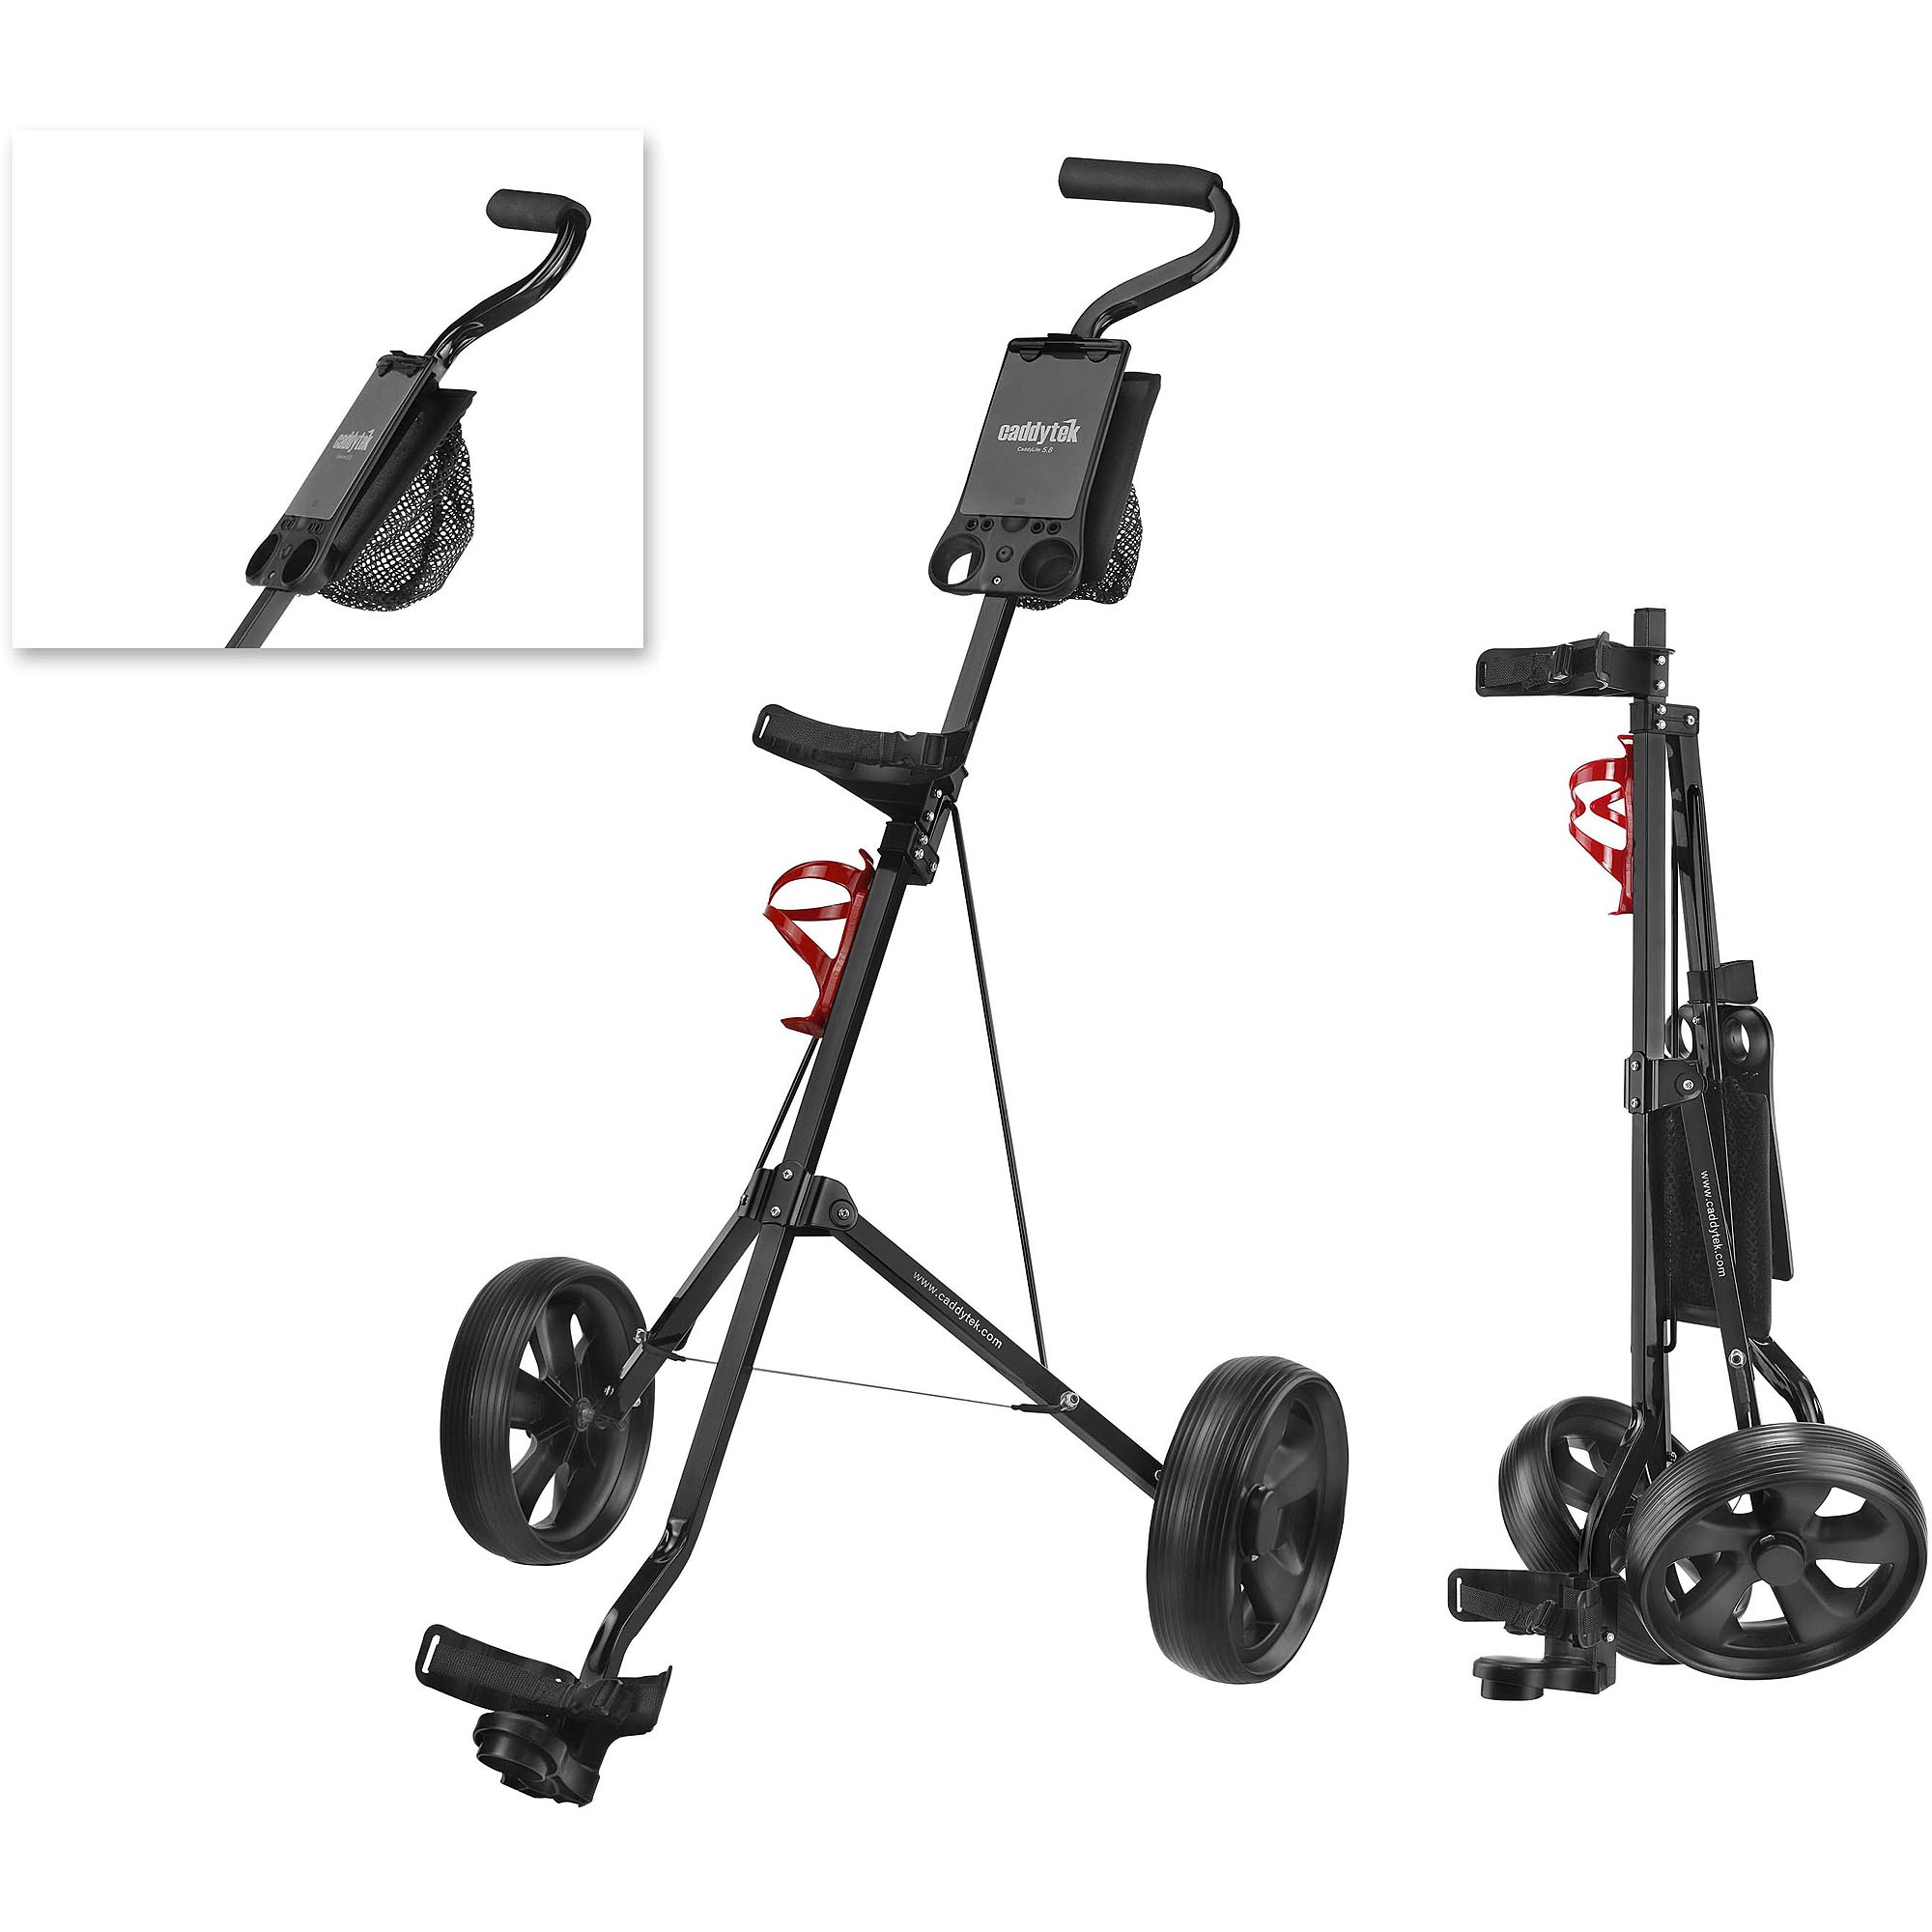 CaddyTek Deluxe 2-Wheel Pull Cart, Black